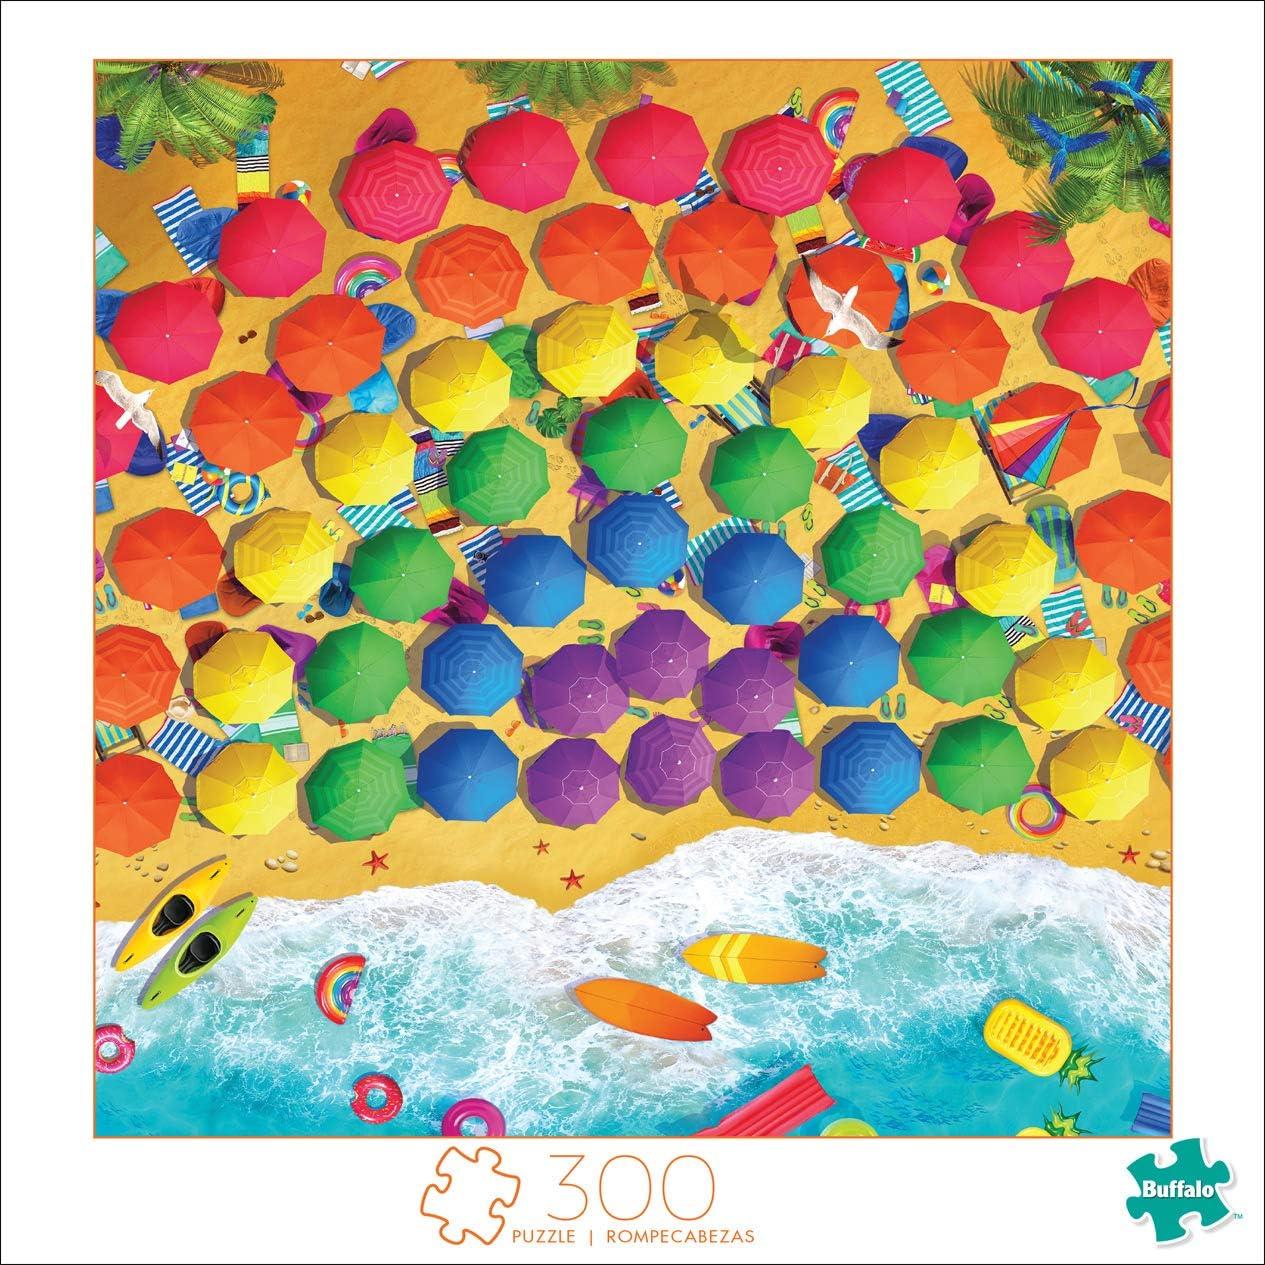 300 Large Piece Jigsaw Puzzle Rainbow Umbrellas Buffalo Games